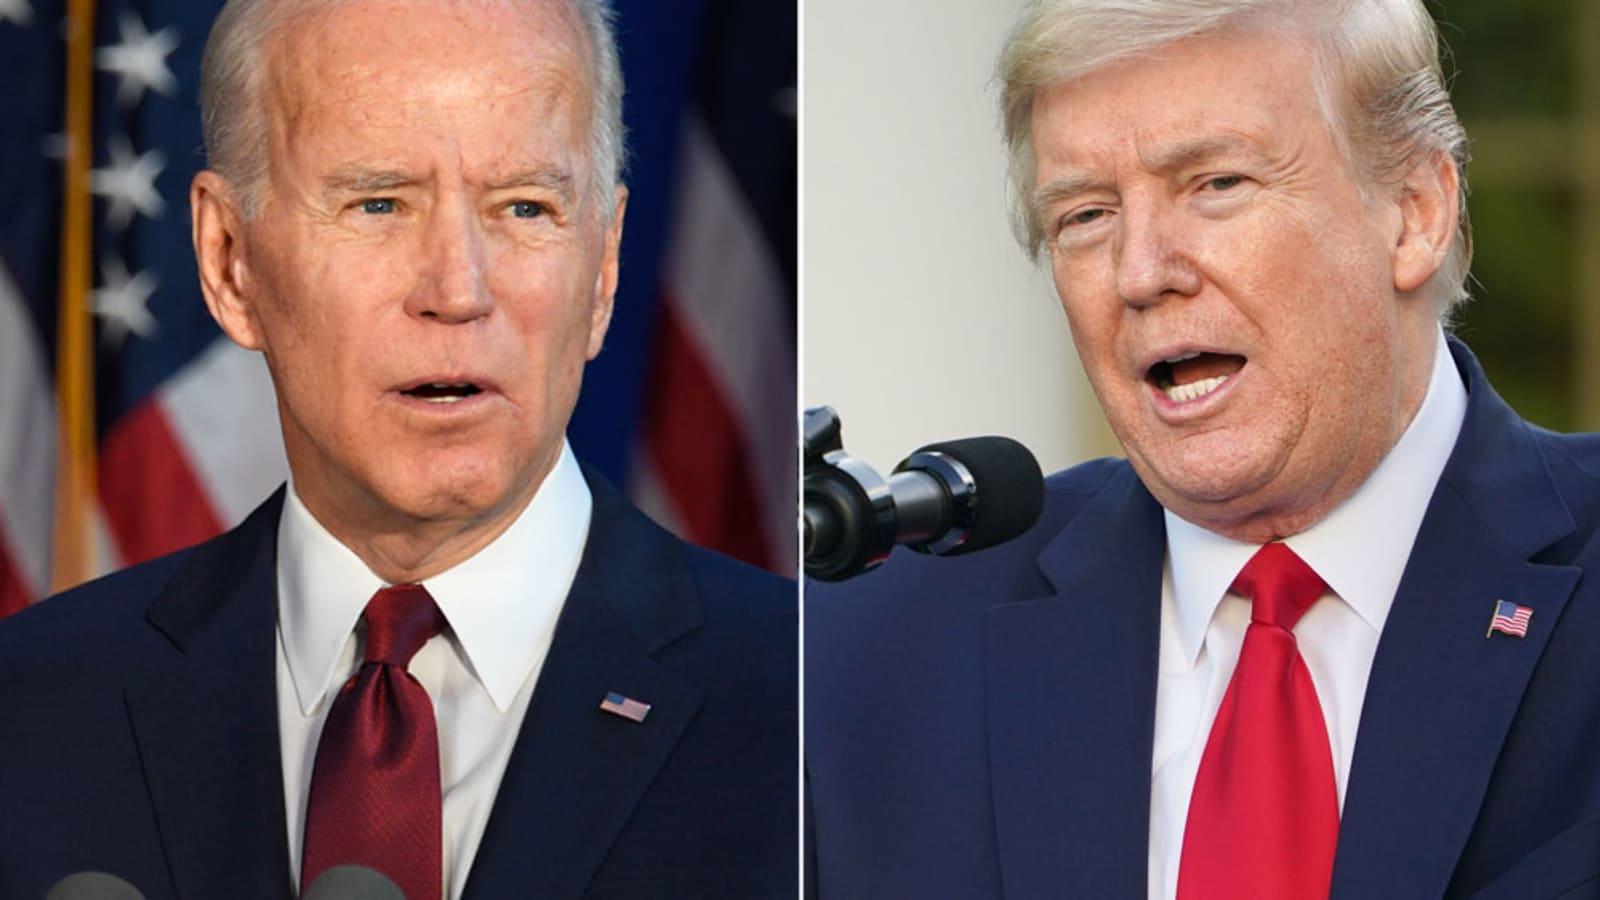 Joe Biden's lead against Trump in 2020 election is growing, polls show